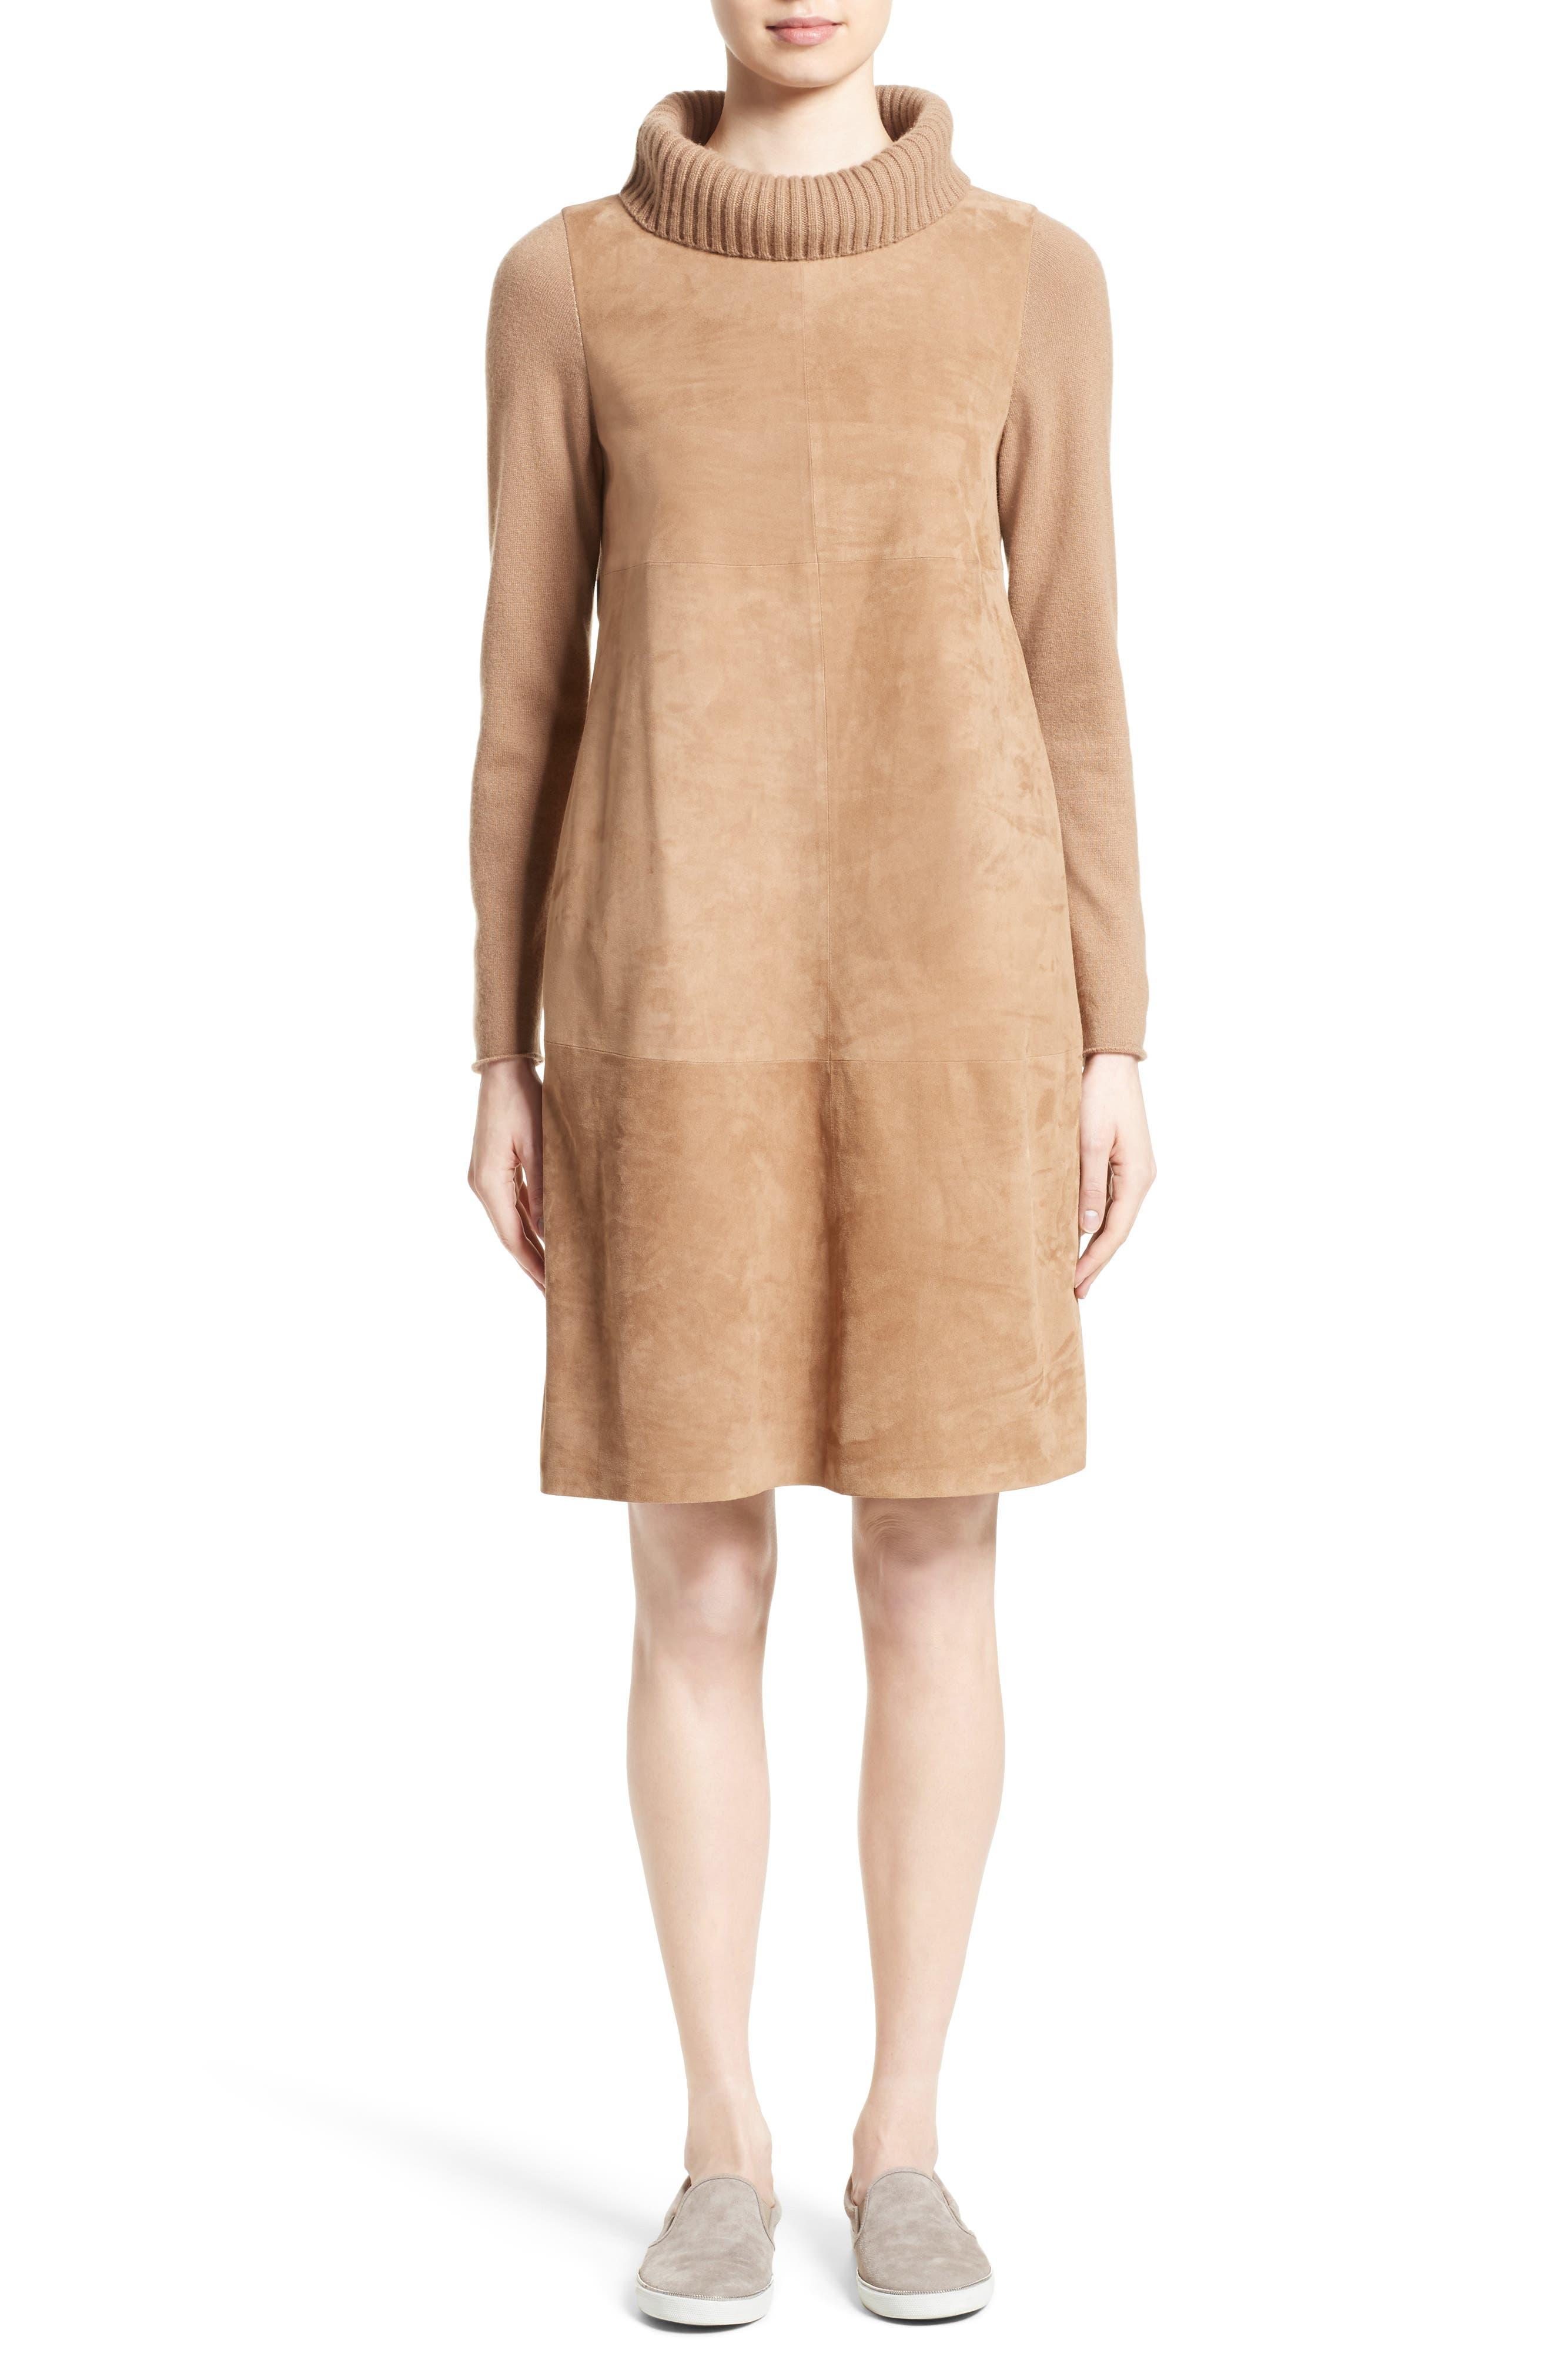 Alternate Image 1 Selected - Fabiana Filippi Suede & Cashmere Dress